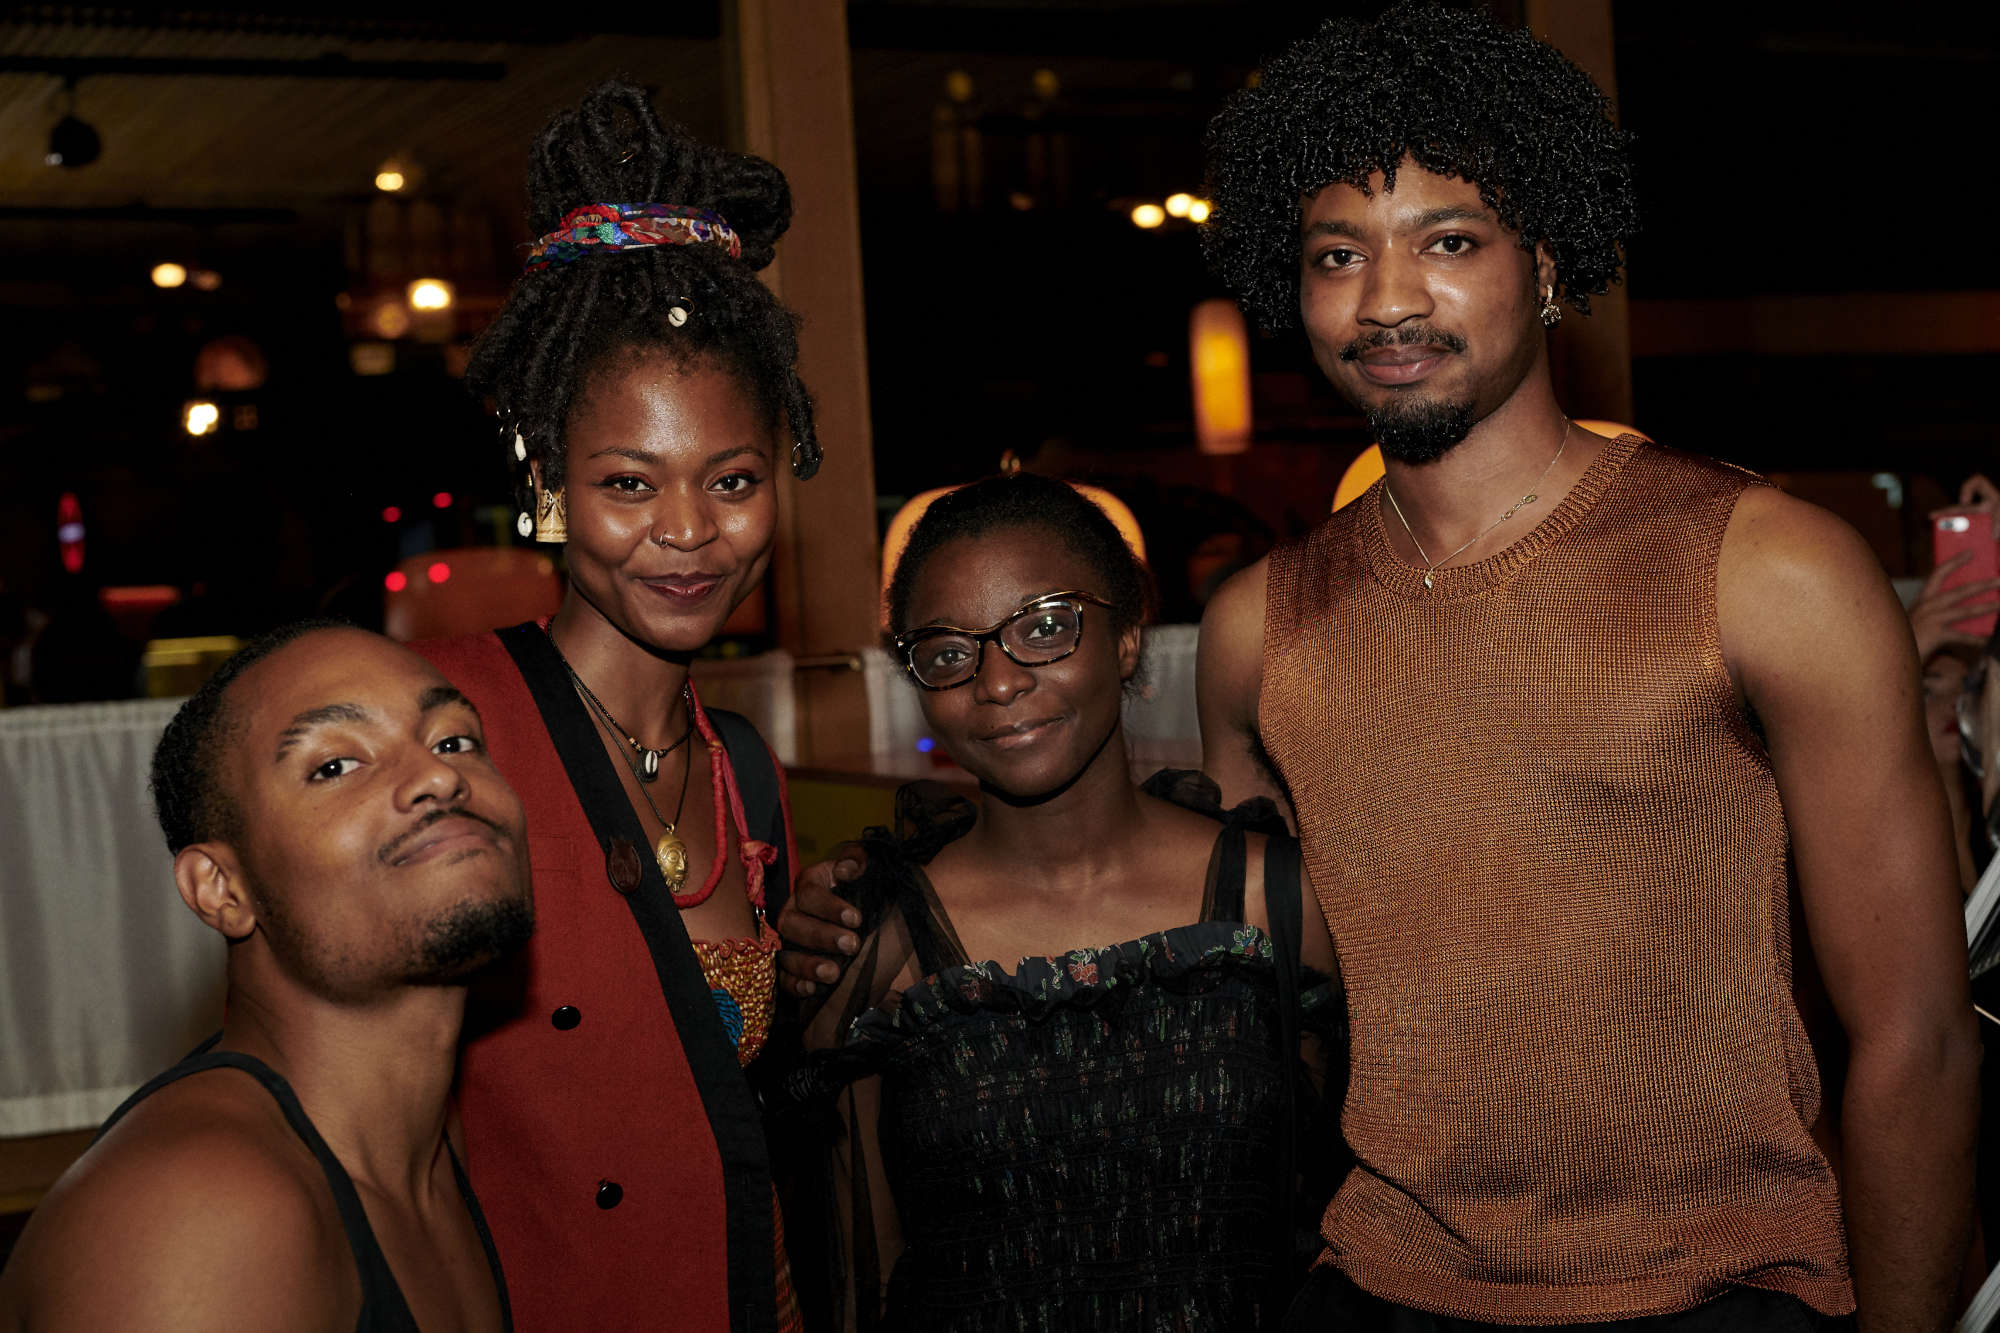 Jonathan Johnson and friends